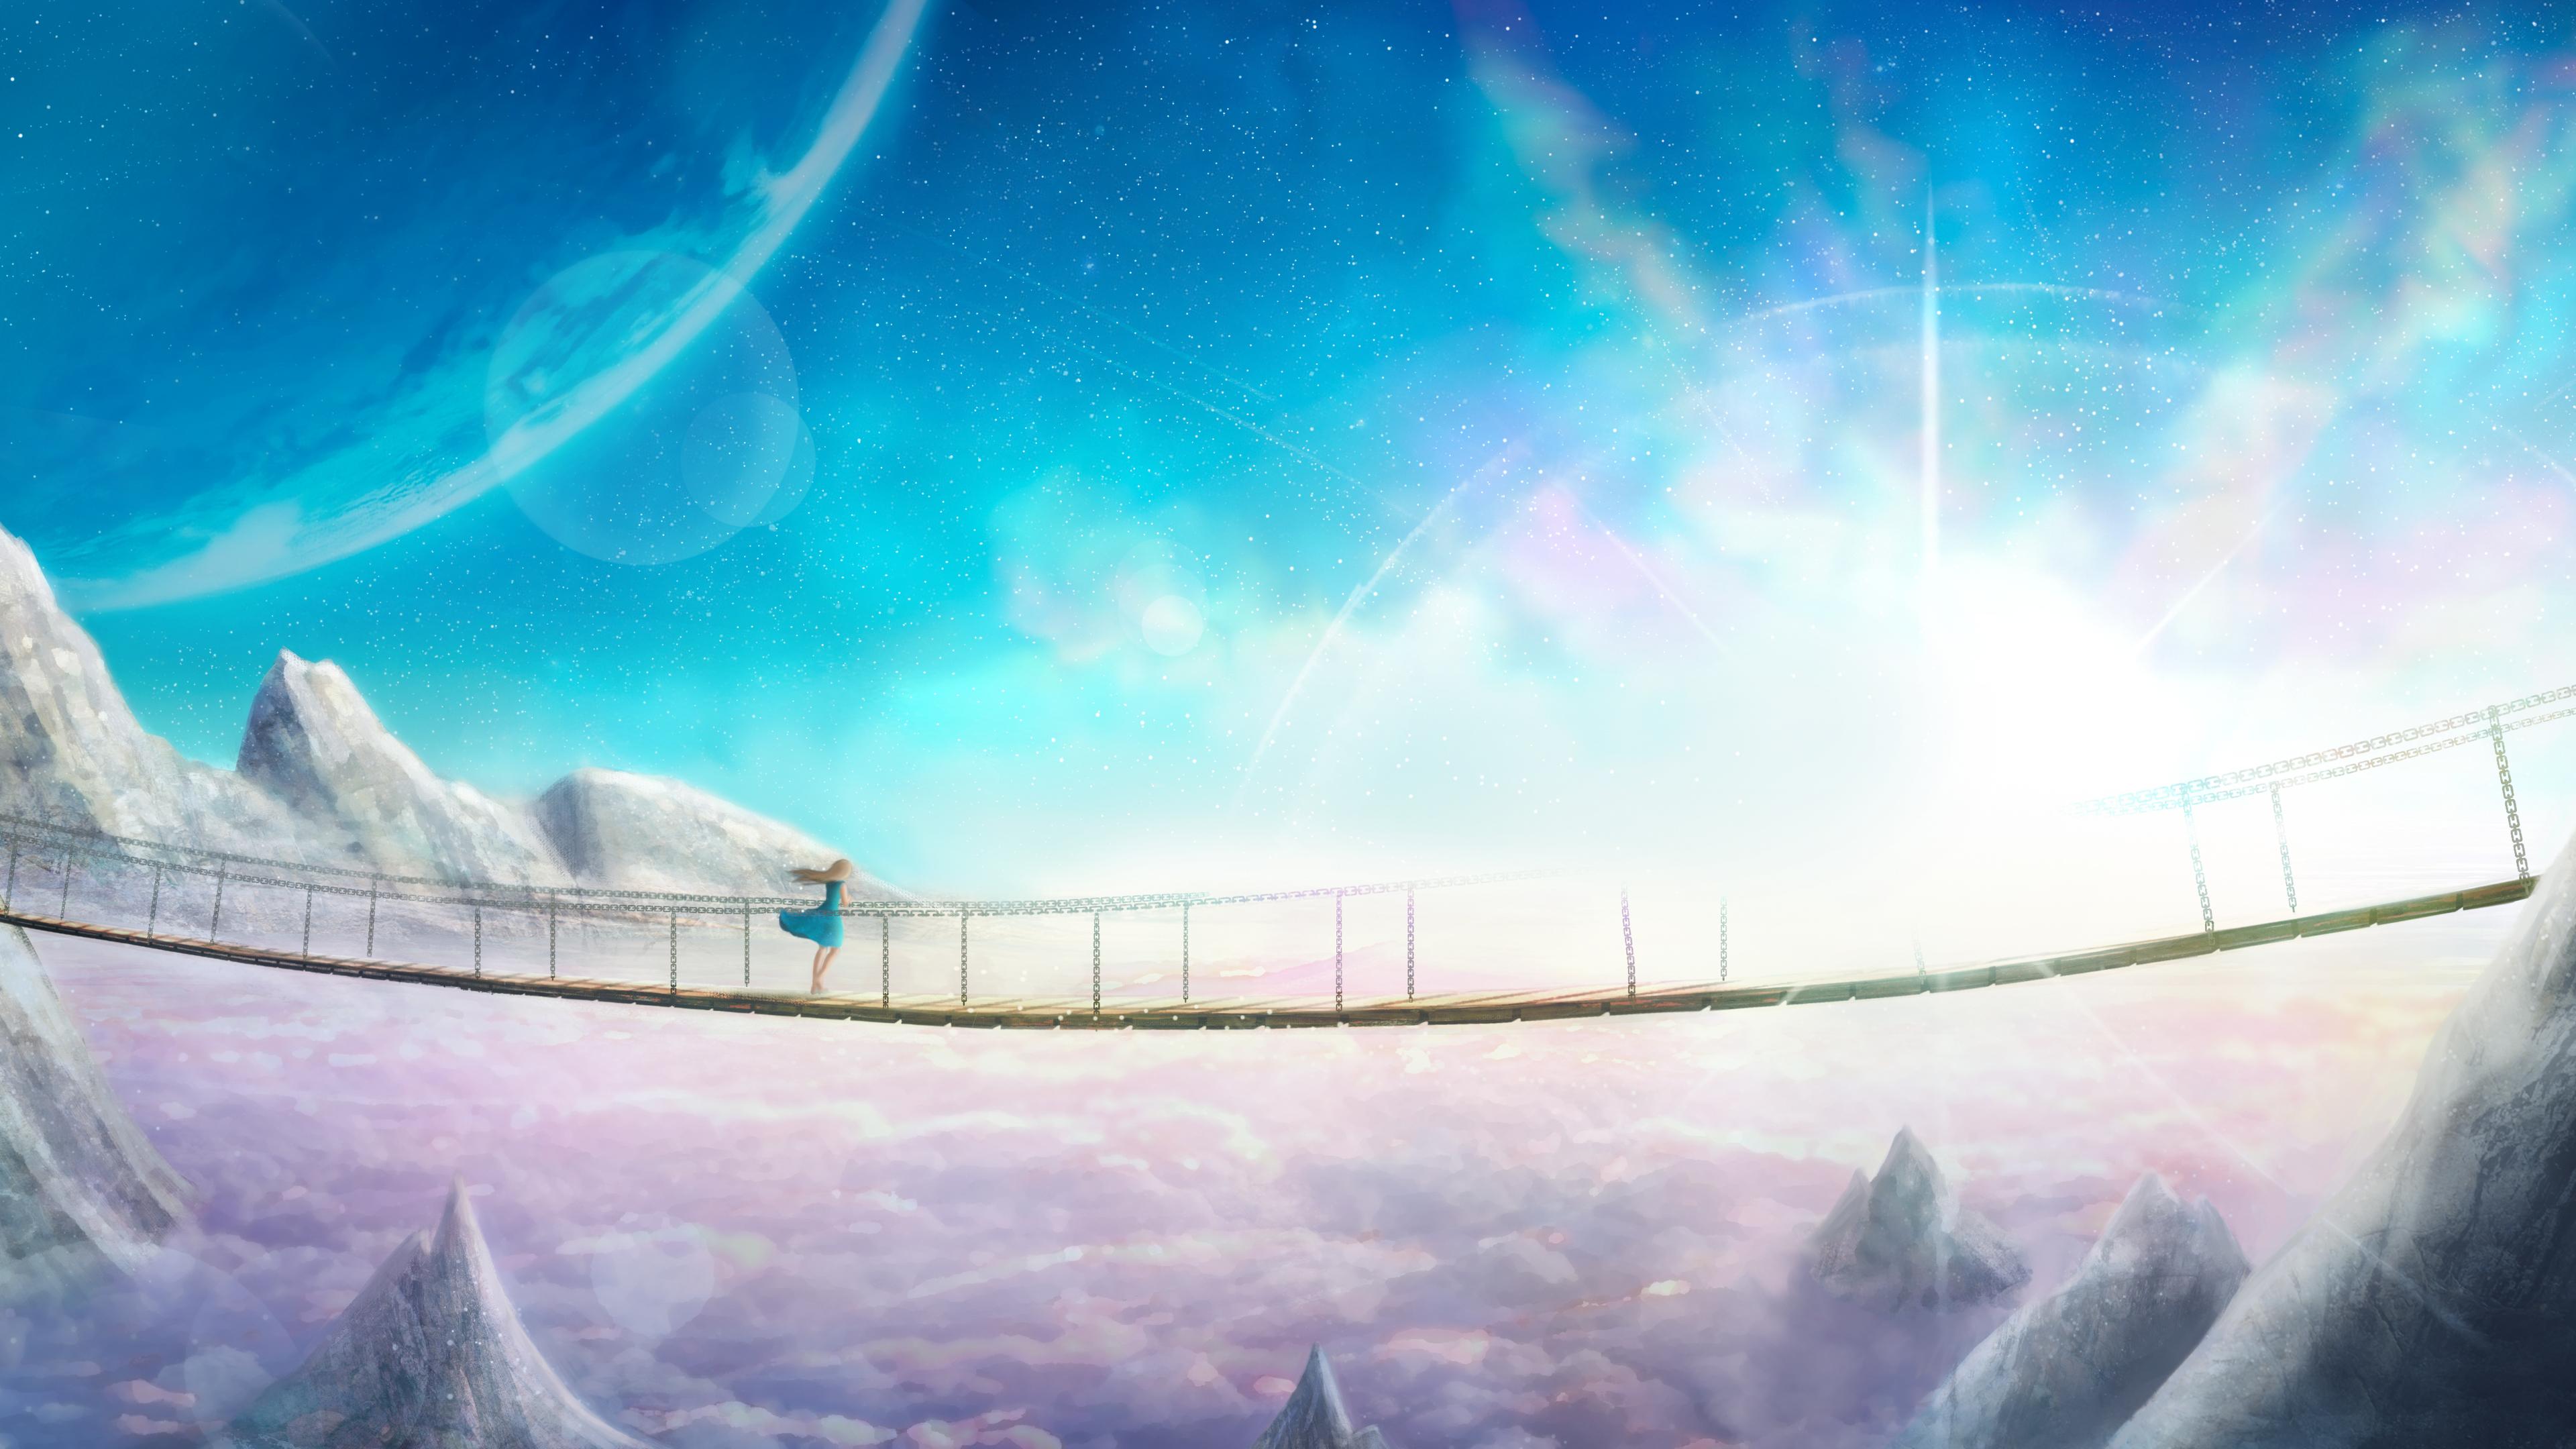 Cute Baby Wolf Wallpaper Supernova Anime Landscape Hd Wallpapers Fantasy